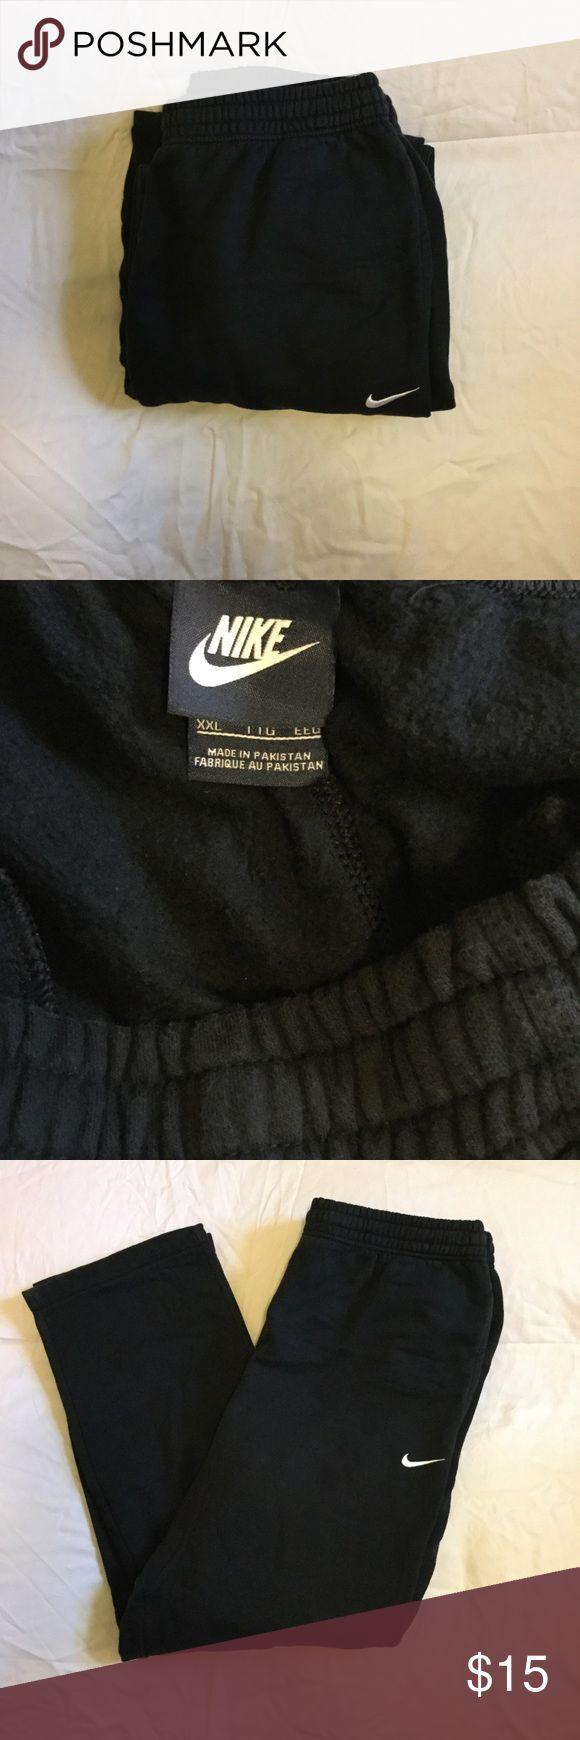 Men's Nike Sweatpants. All black Nike Sweatpants. Cotton material. Super soft. Good condition. Offers welcome. Nike Pants Sweatpants & Joggers